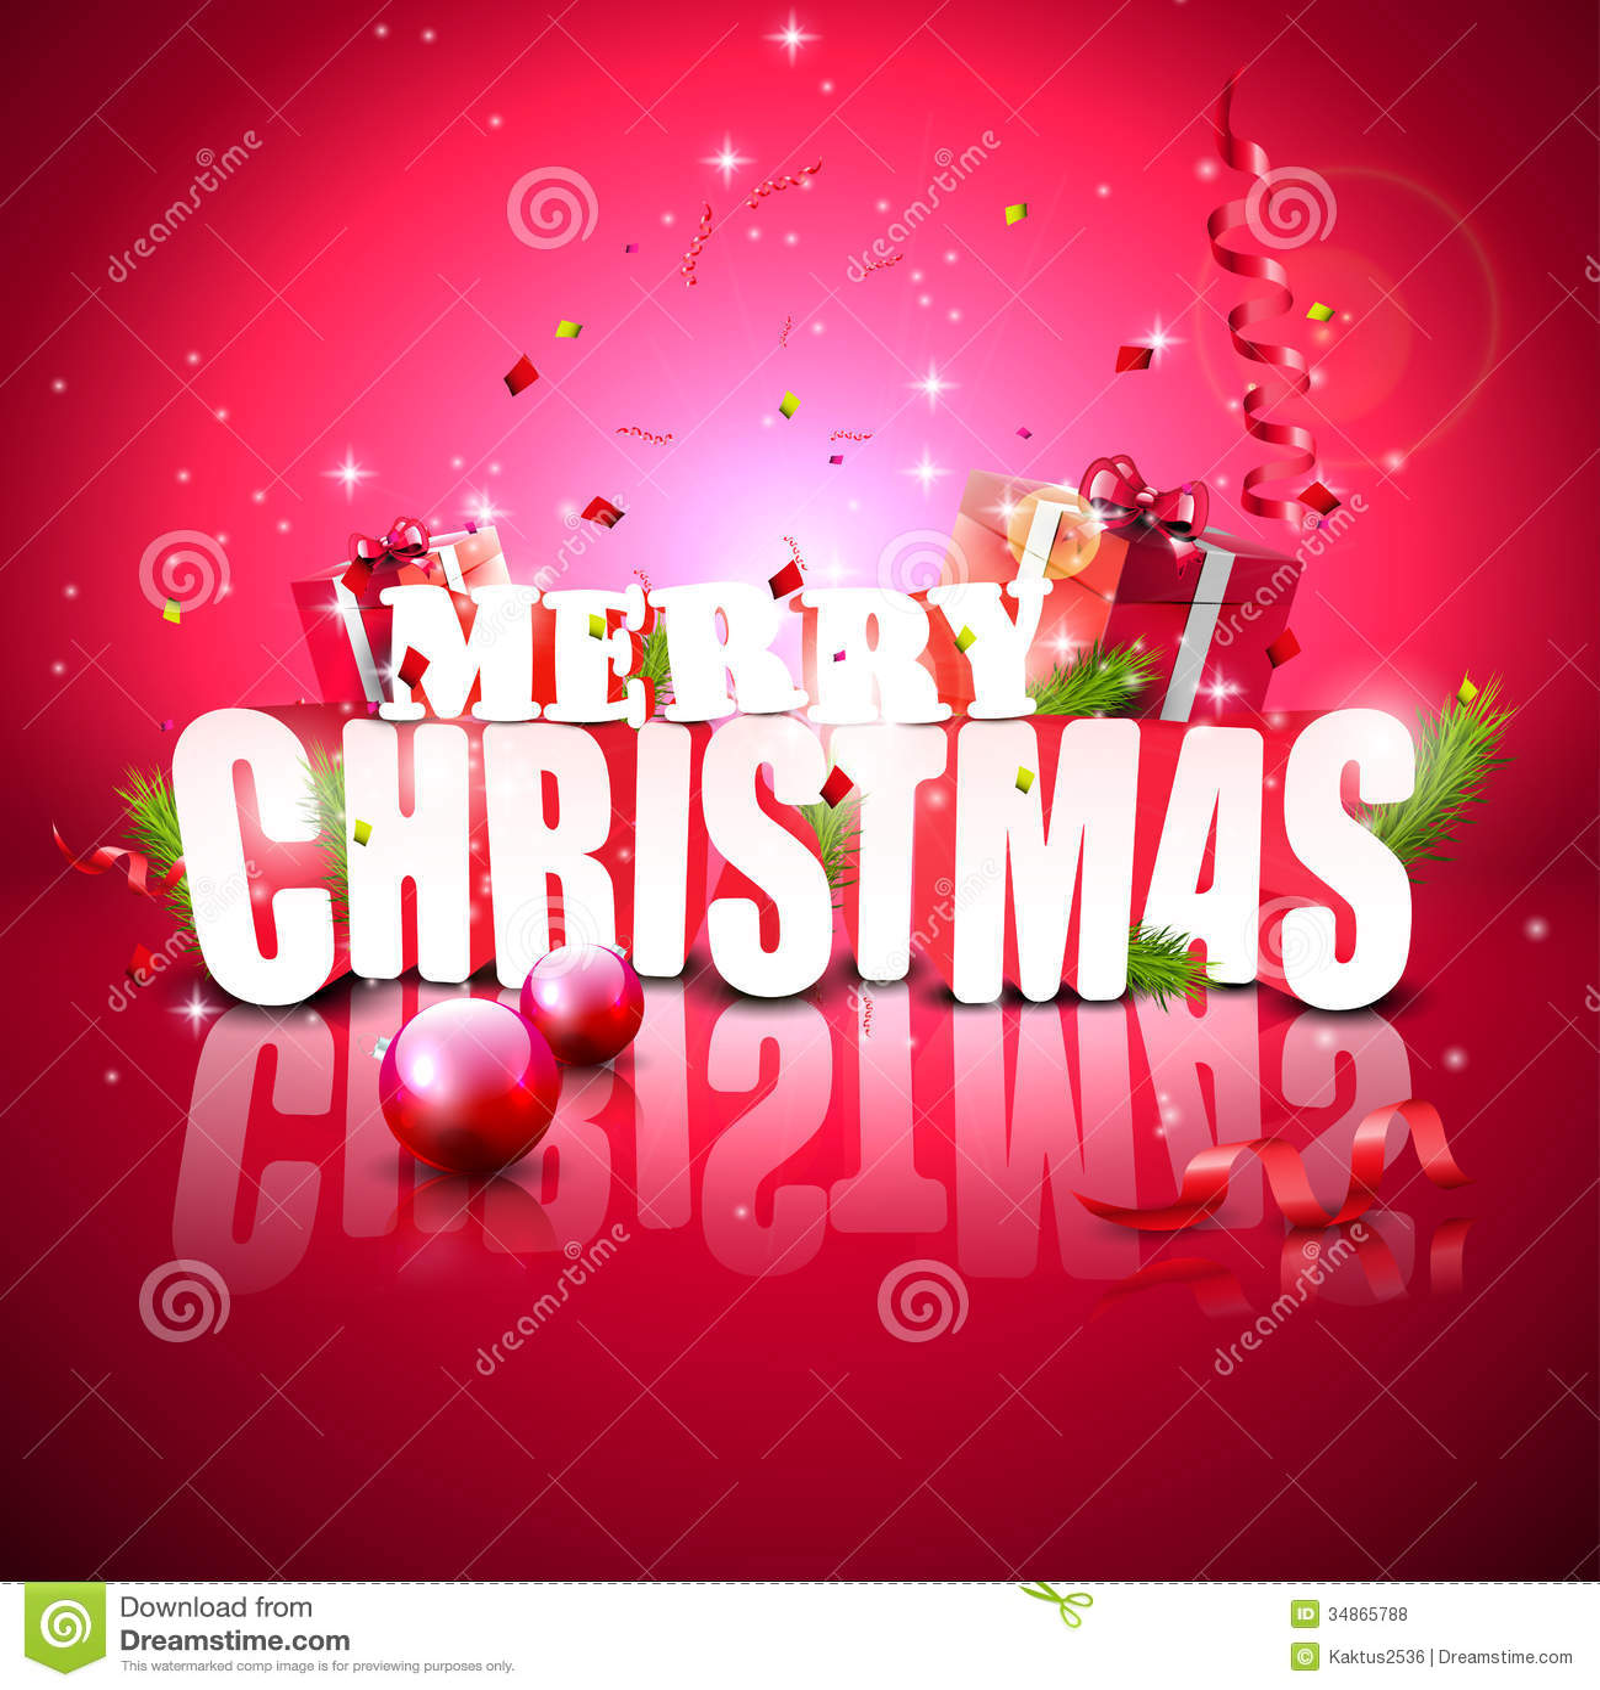 Modern christmas greeting card stock photo image of events modern christmas greeting card kristyandbryce Image collections